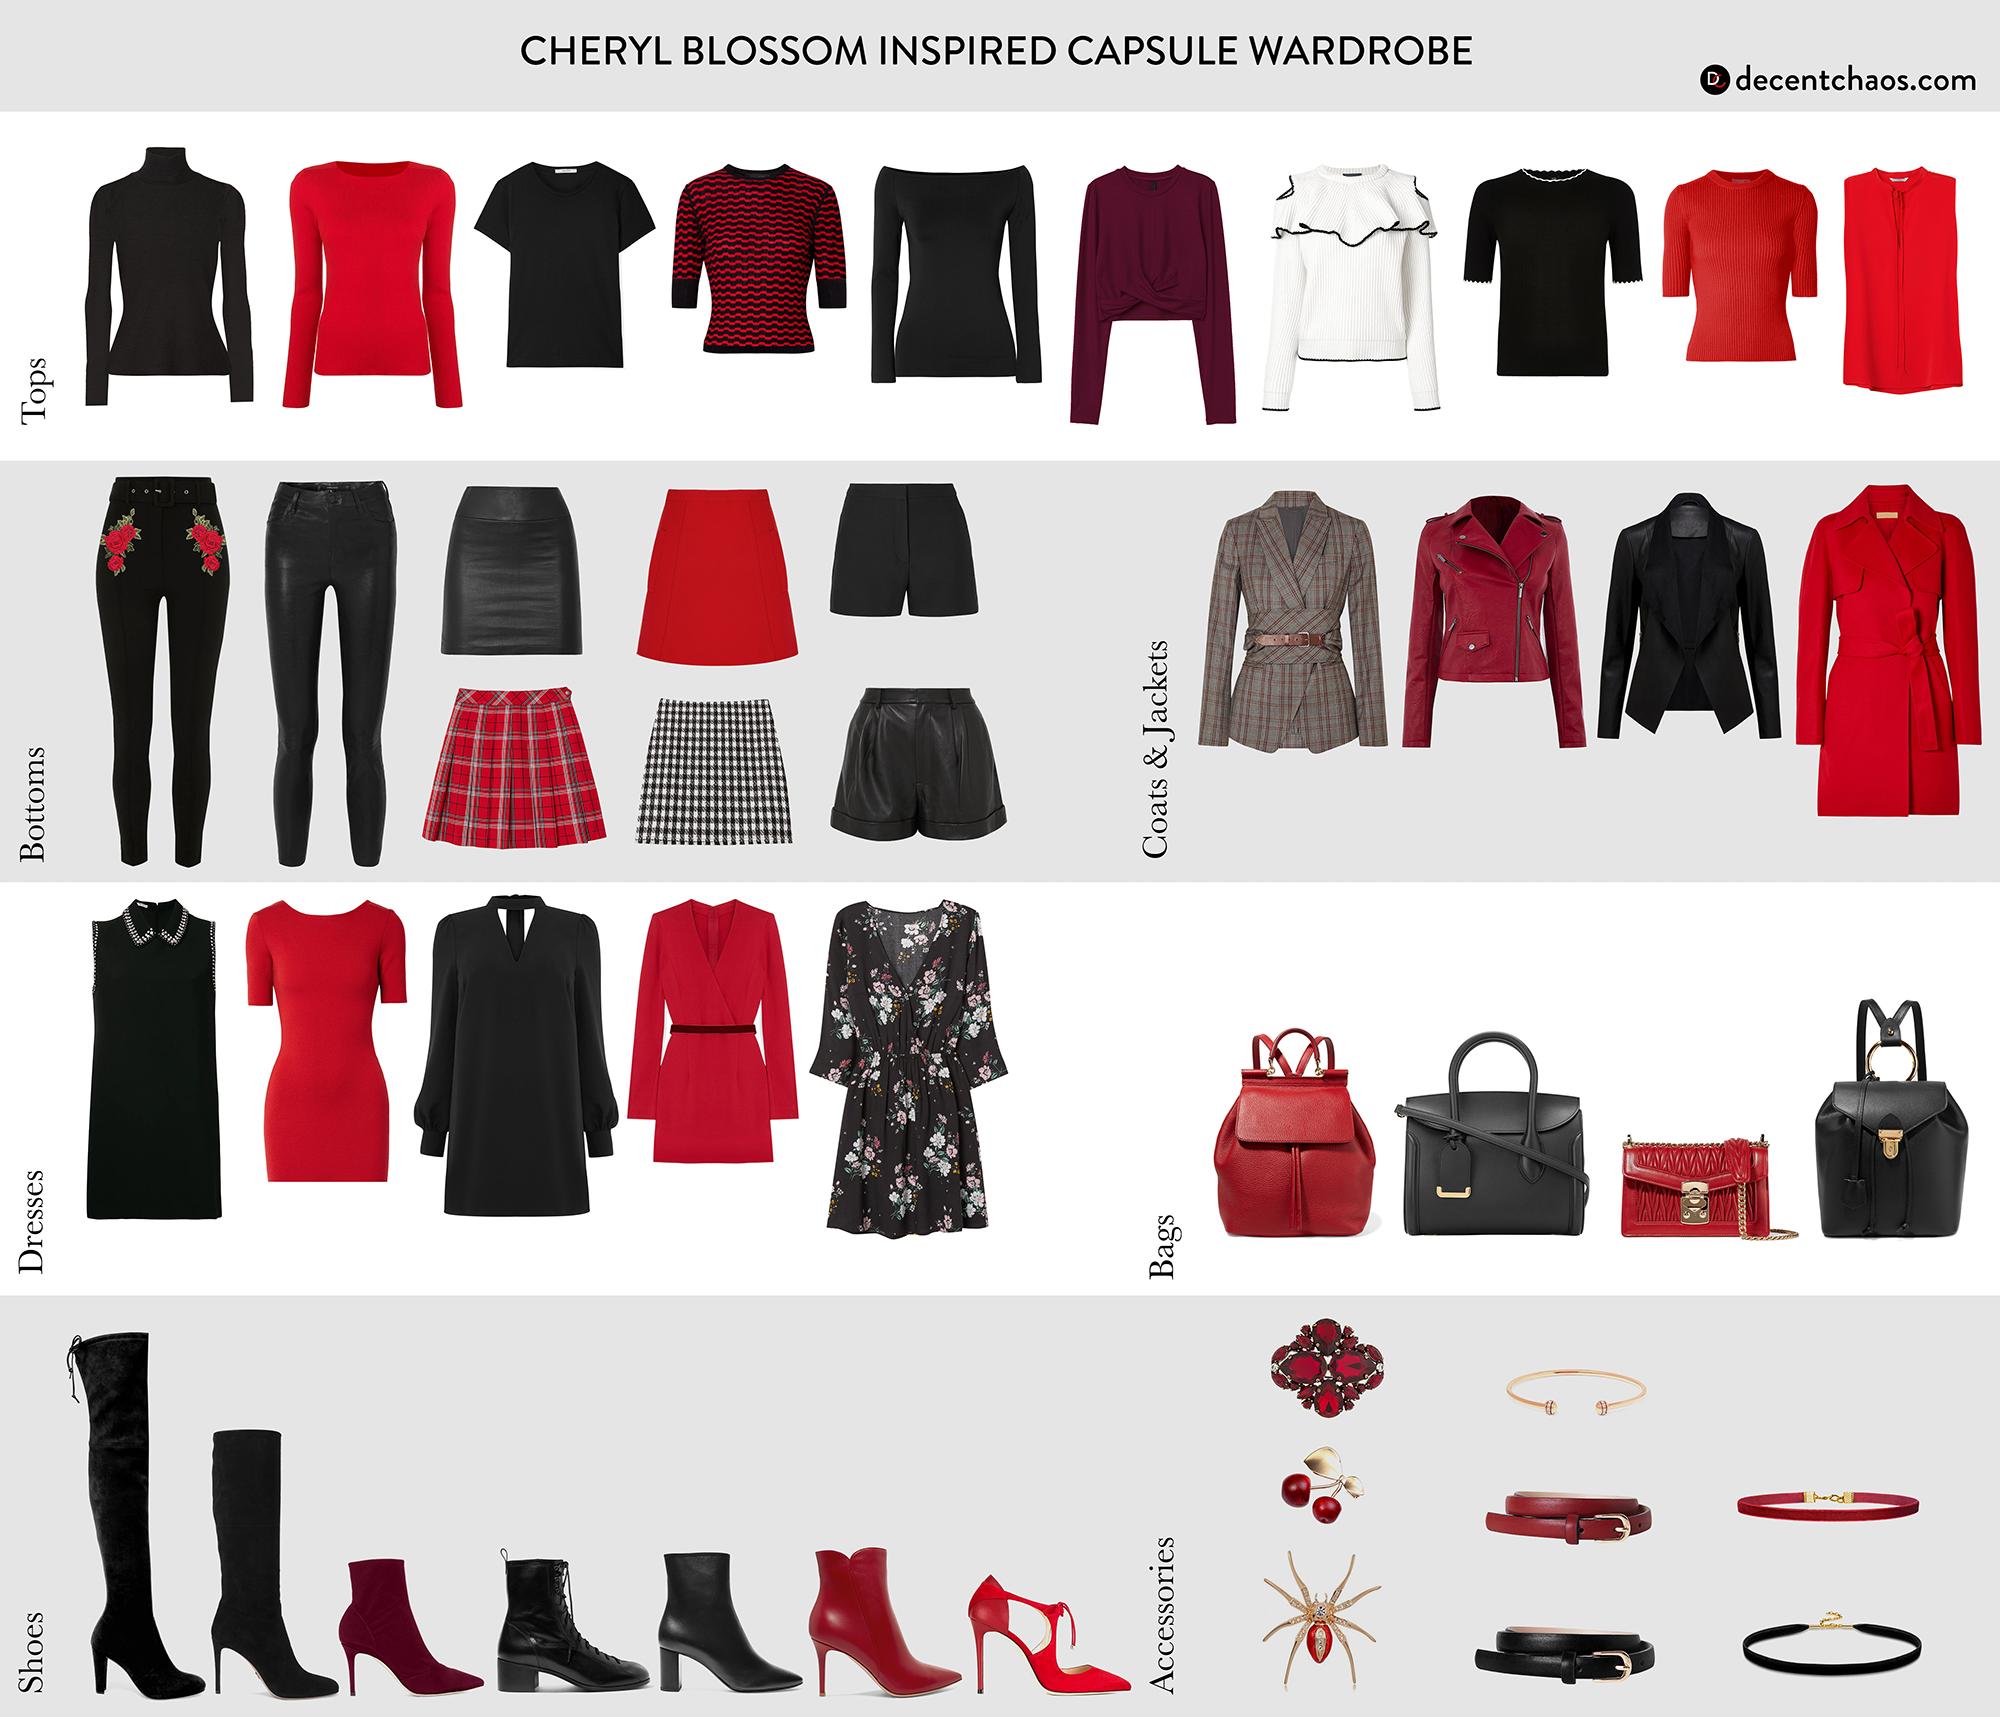 cheryl-blossom-capsule-wardrobe.jpg